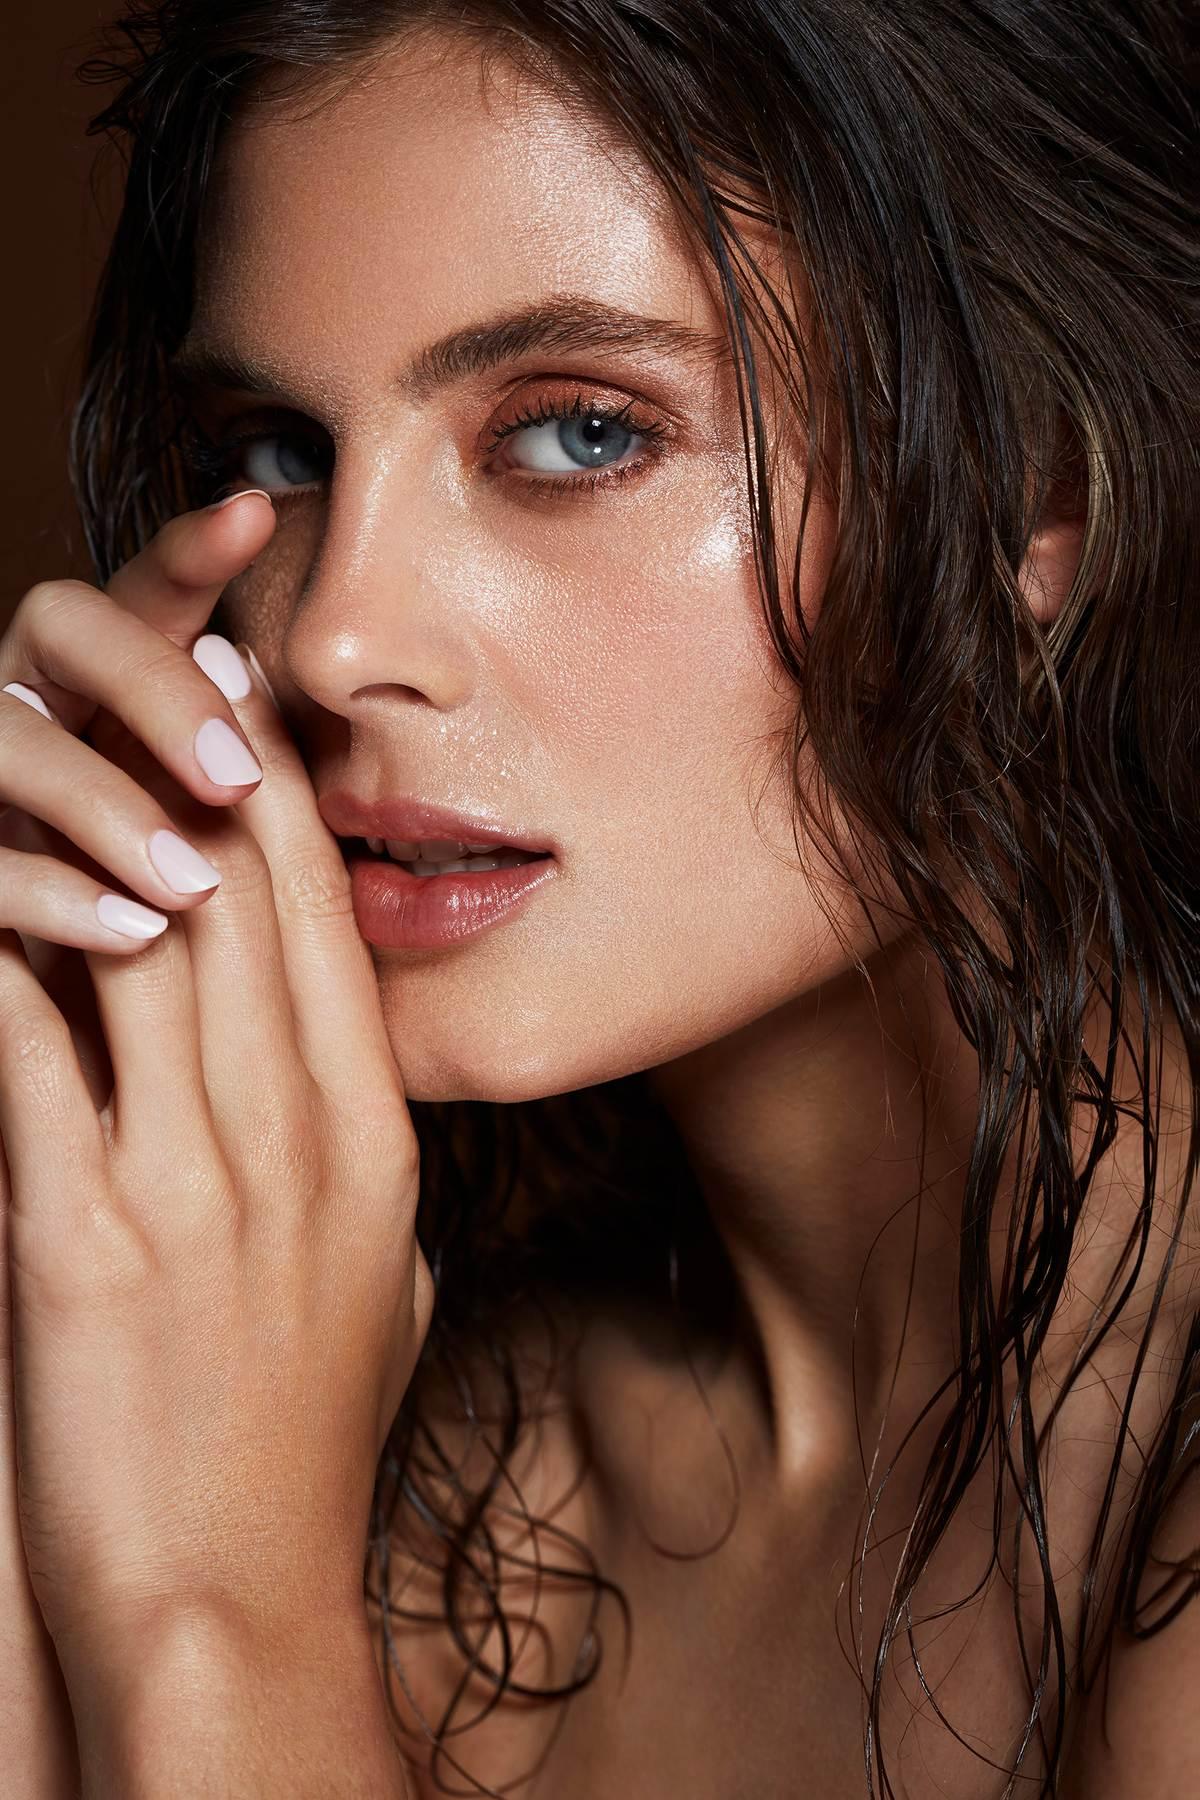 moisture_skin_deep_hydration_model_organic_natural_beauty_DT_LB_maggie344_v2.jpg